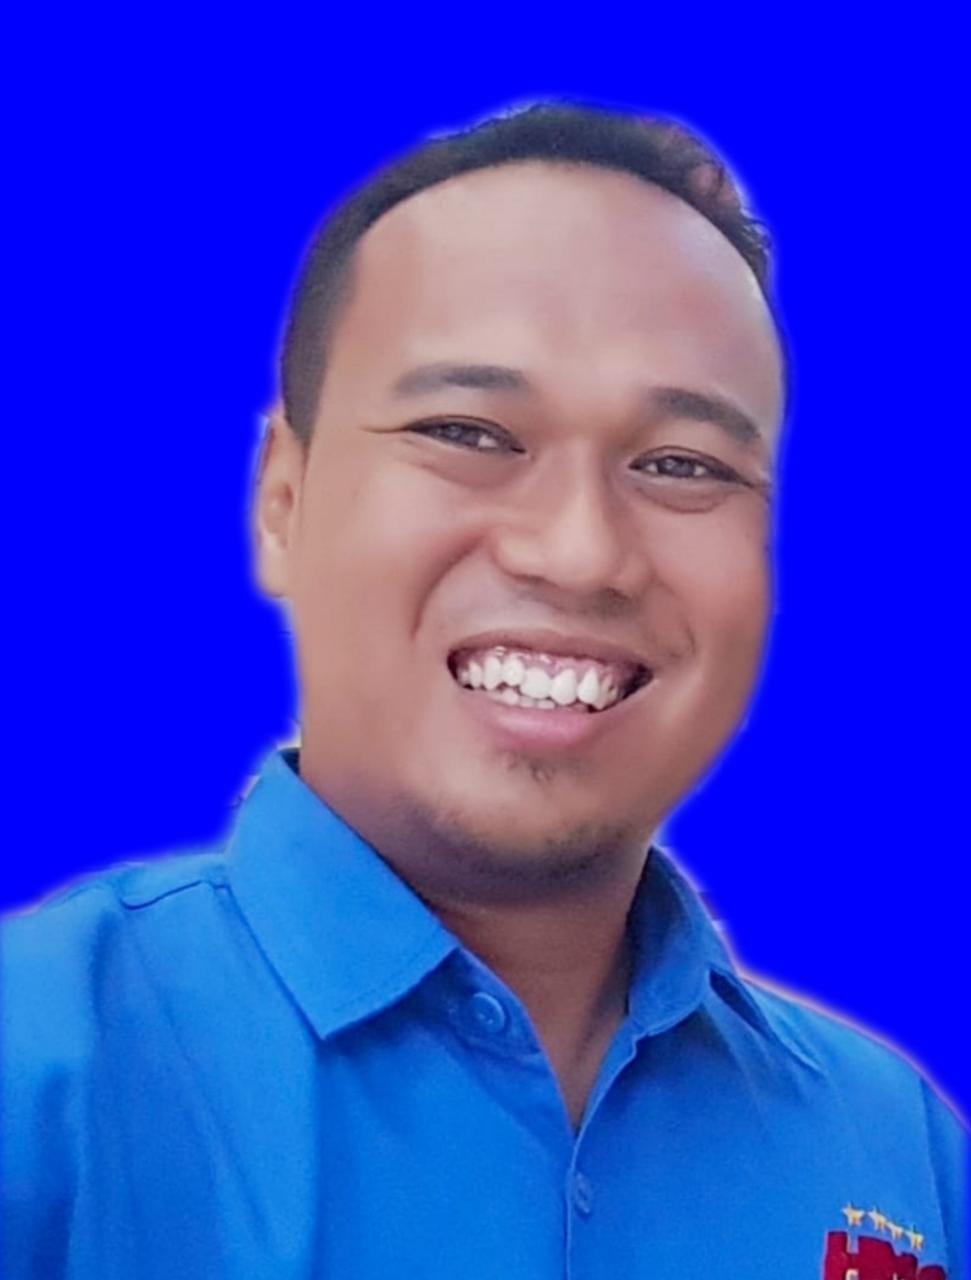 Kristyanto Wahyu Budi Prasetya